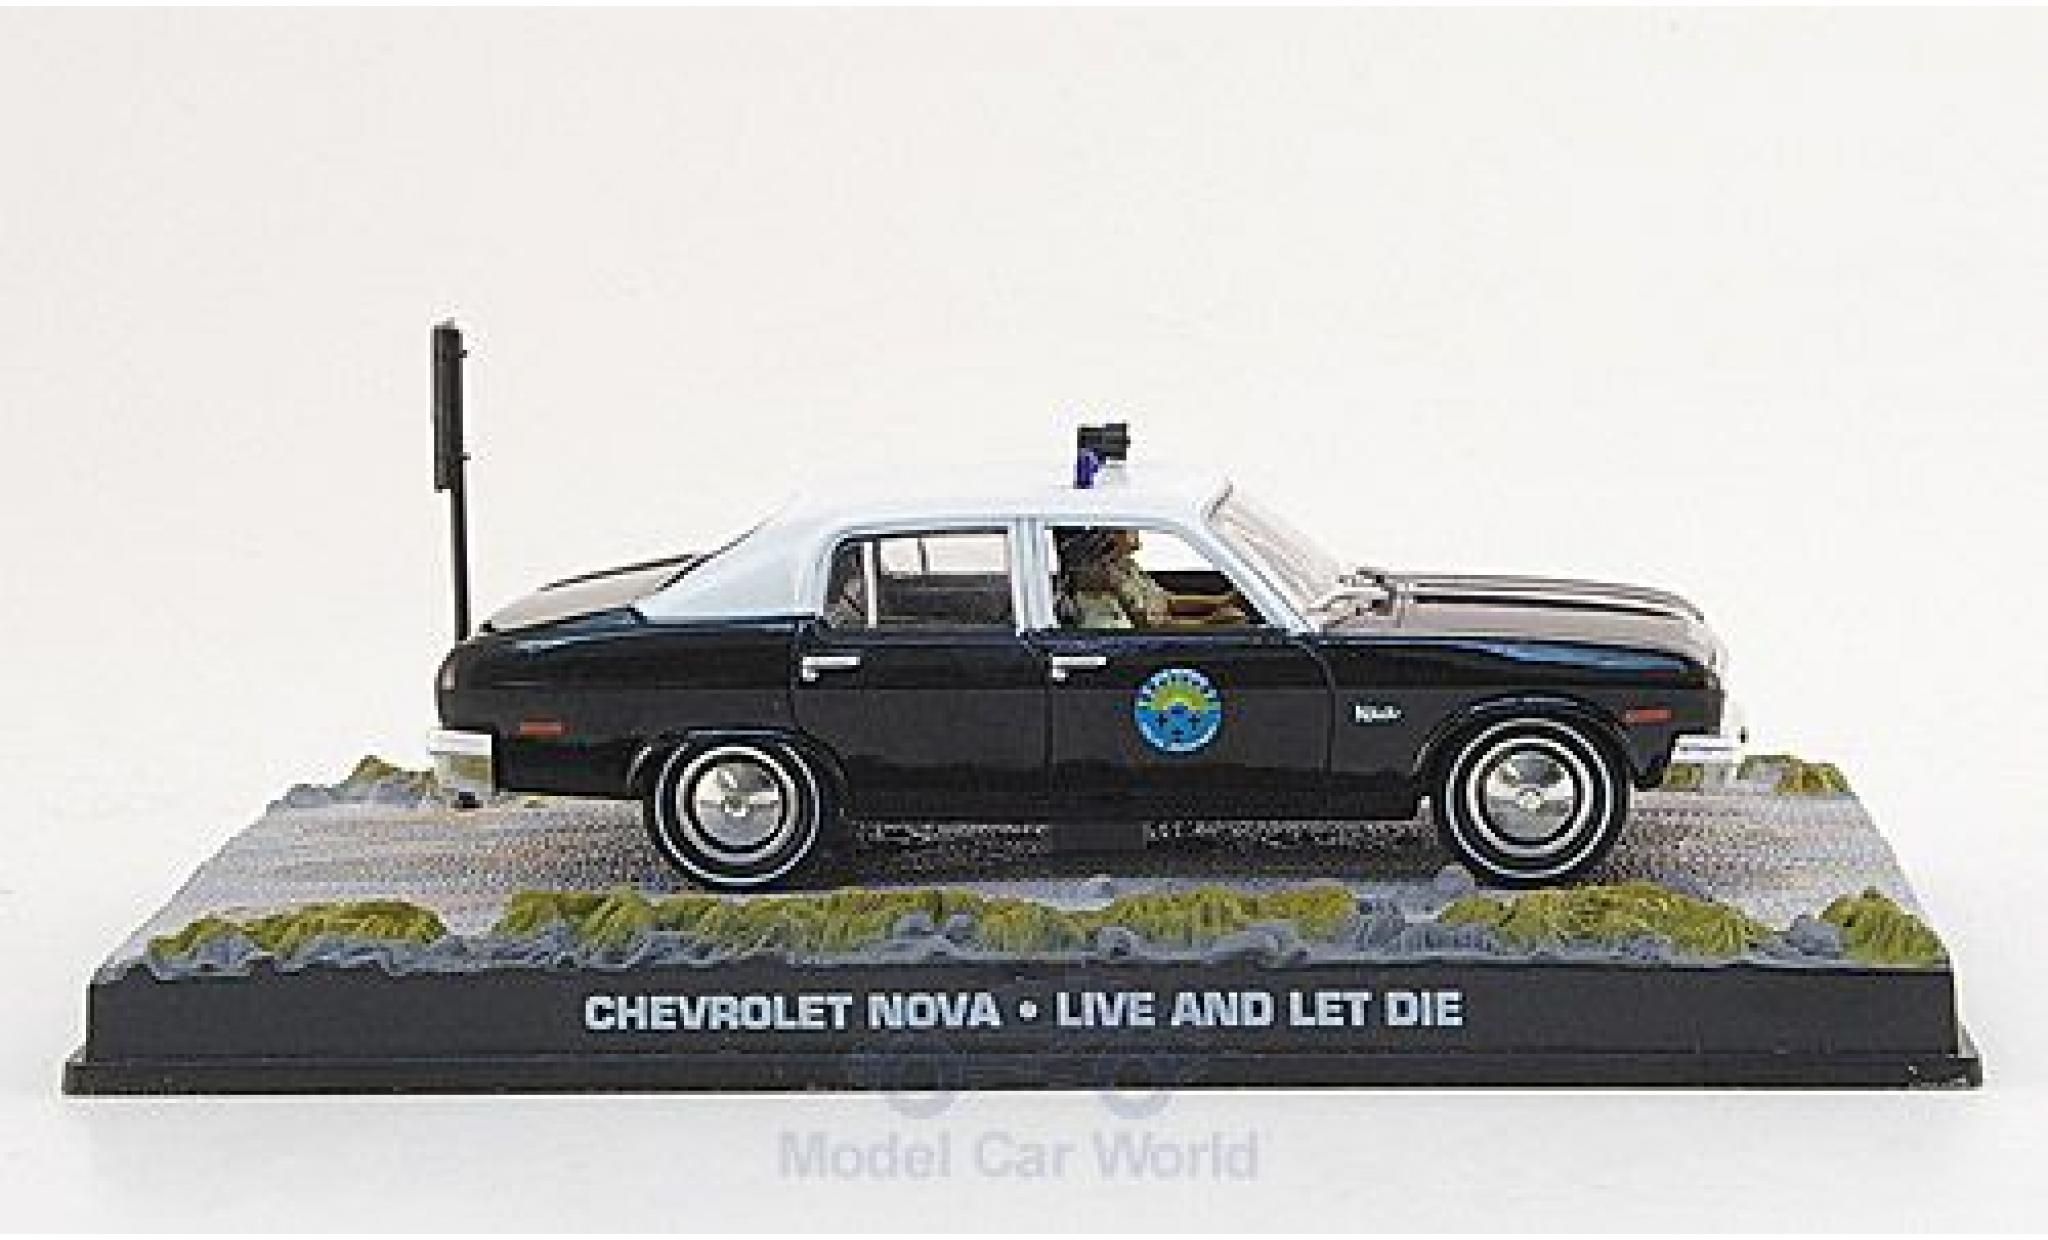 Chevrolet Nova 1/43 SpecialC 007 black/white James Bond 007 1973 Police Leben und sterben lassen ohne Vitrine